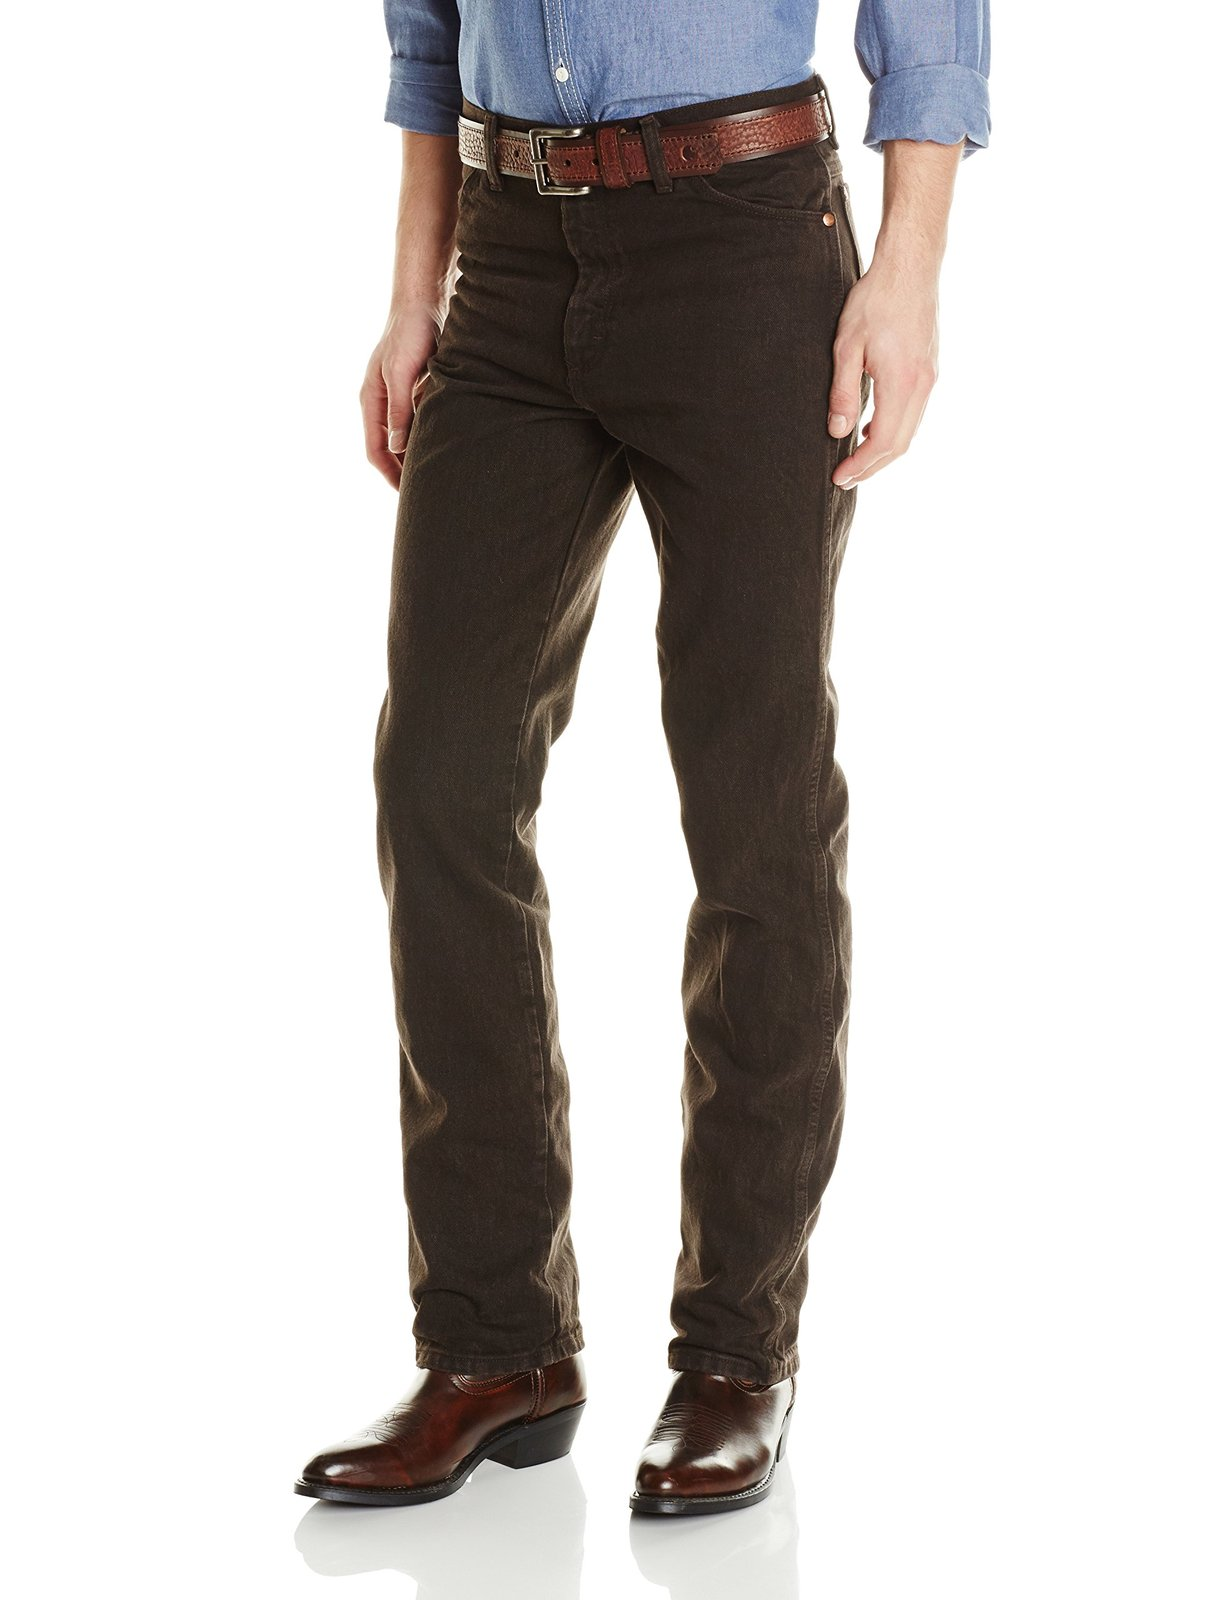 Centenario Mens Cowboy Denim Jeans Color Indigo